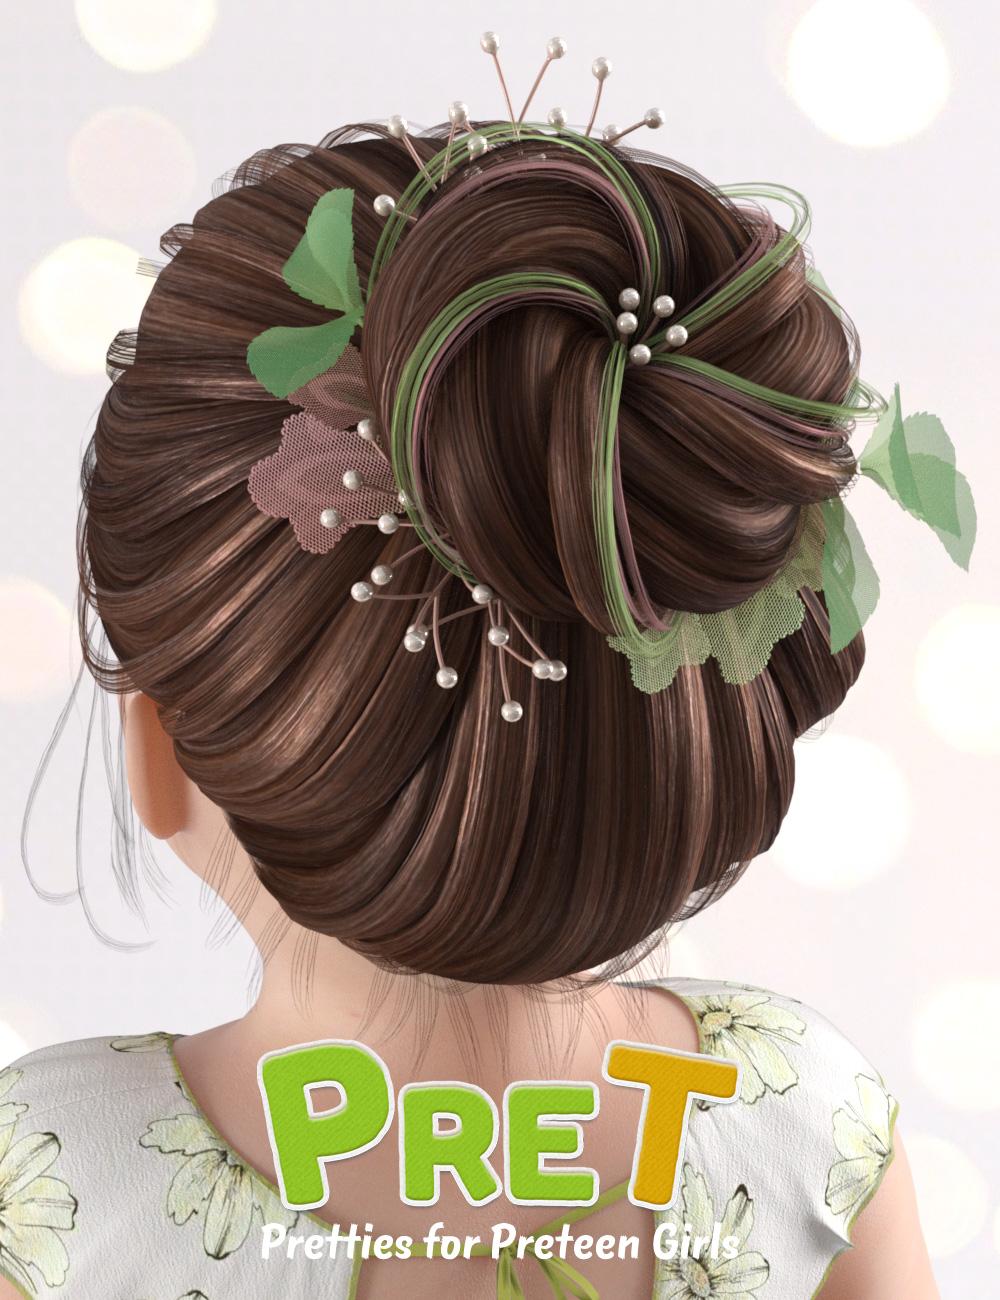 PreT Girls Bloom Hair for Genesis 8 Female(s) by: elleque, 3D Models by Daz 3D